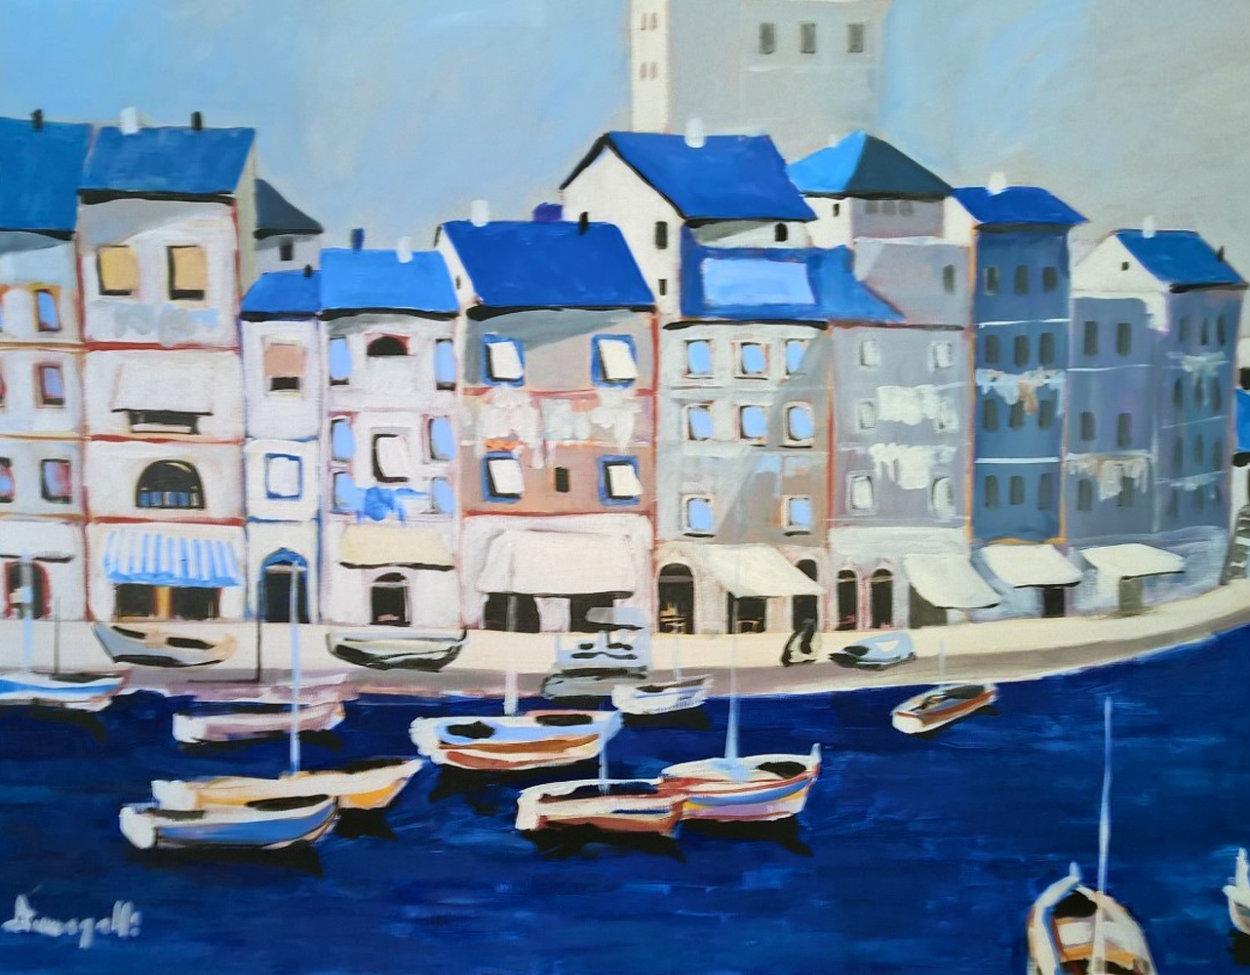 Untitled Itallian Port 1980 36x46 Super Huge Original Painting by Luigi Fumagalli